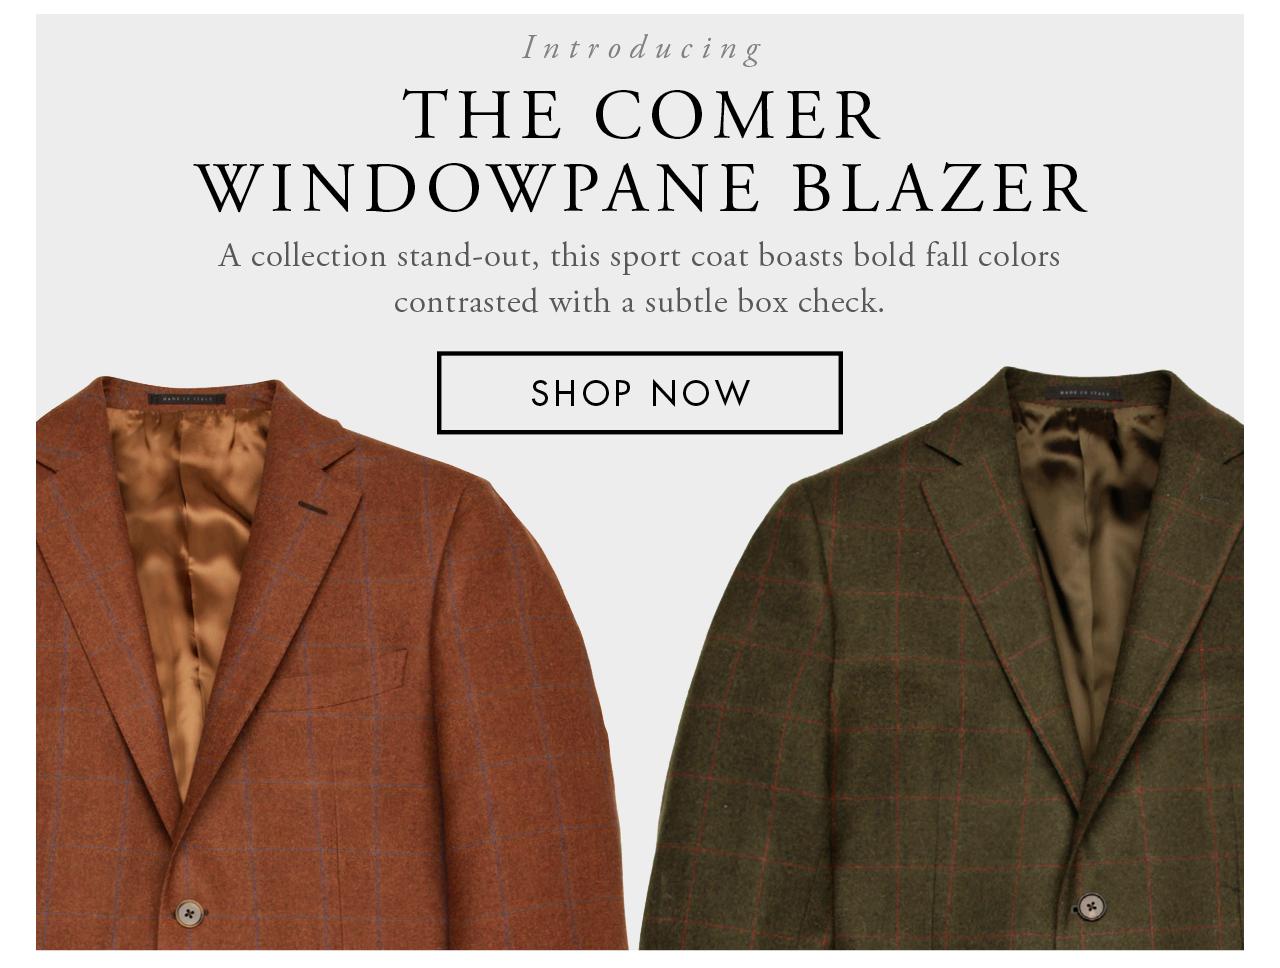 The Comer Windowpane Blazer